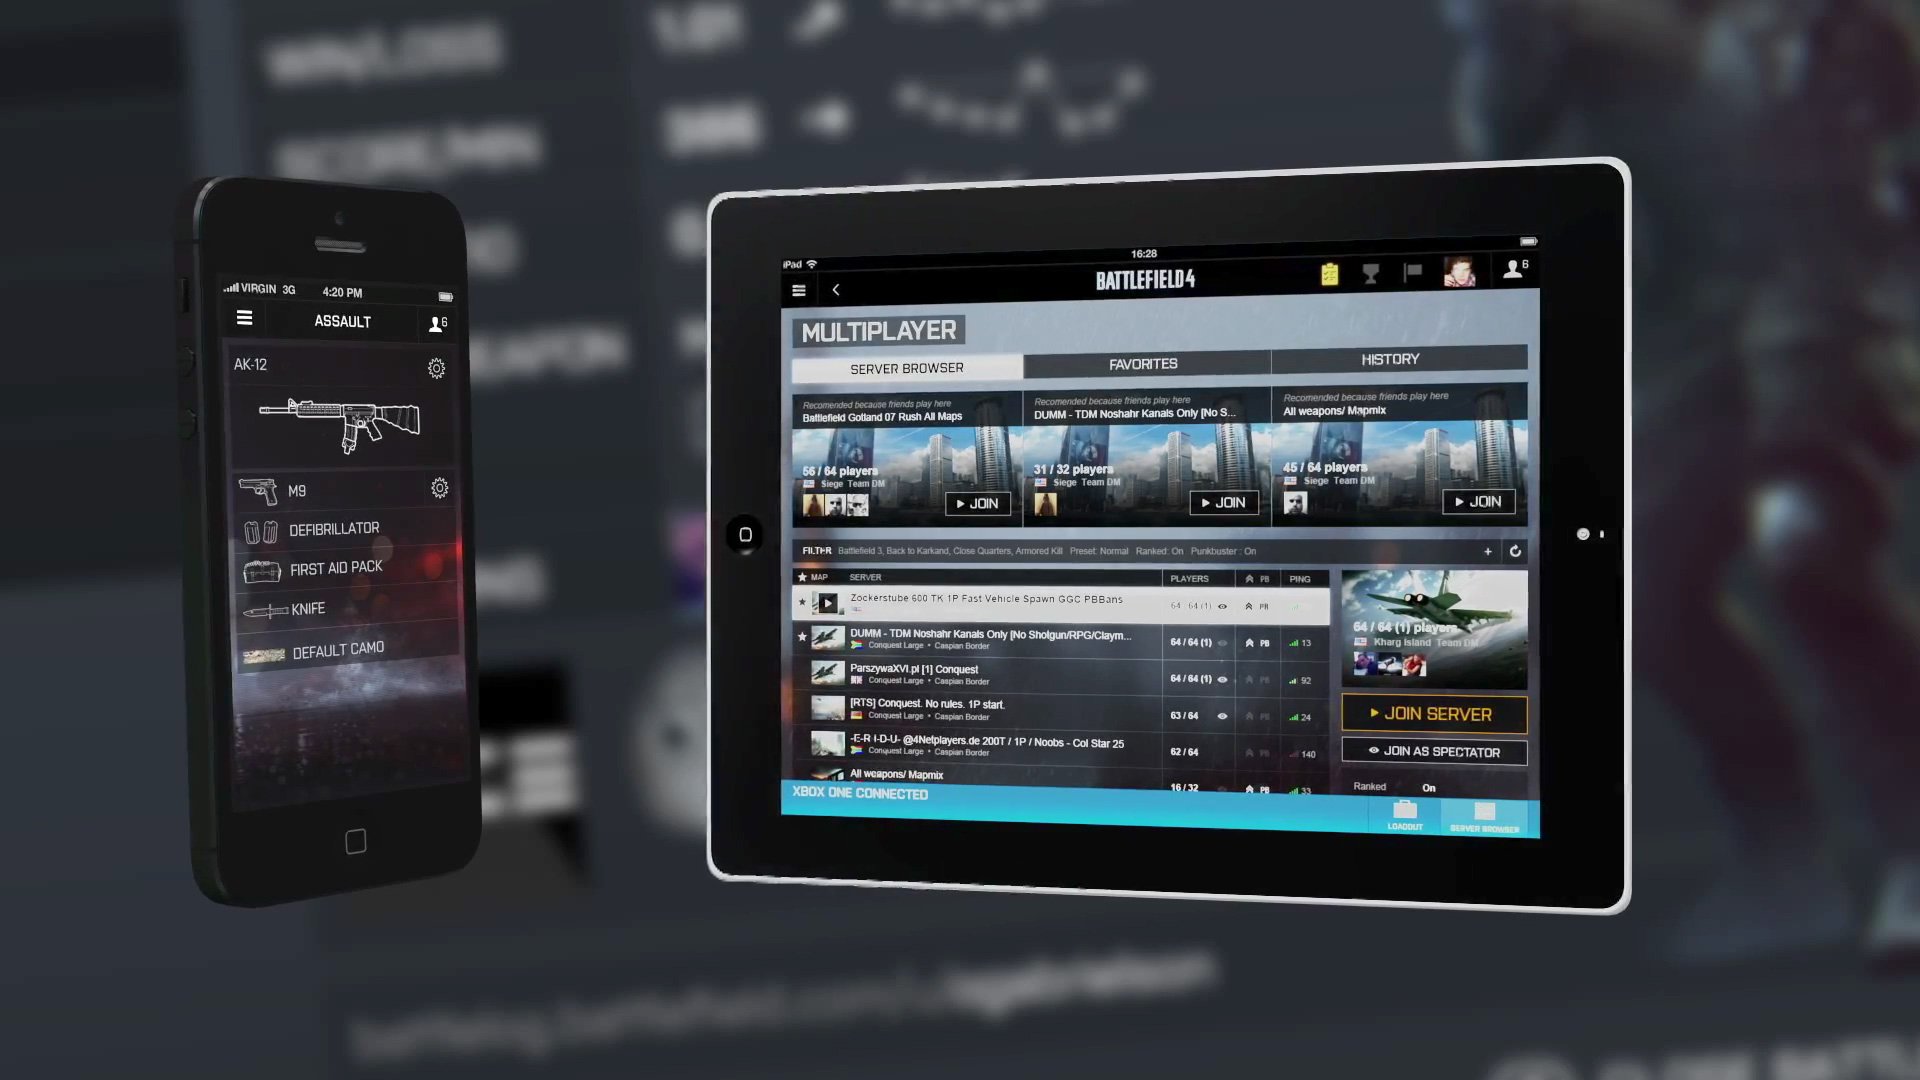 Battlefield 4 - Multiscreen